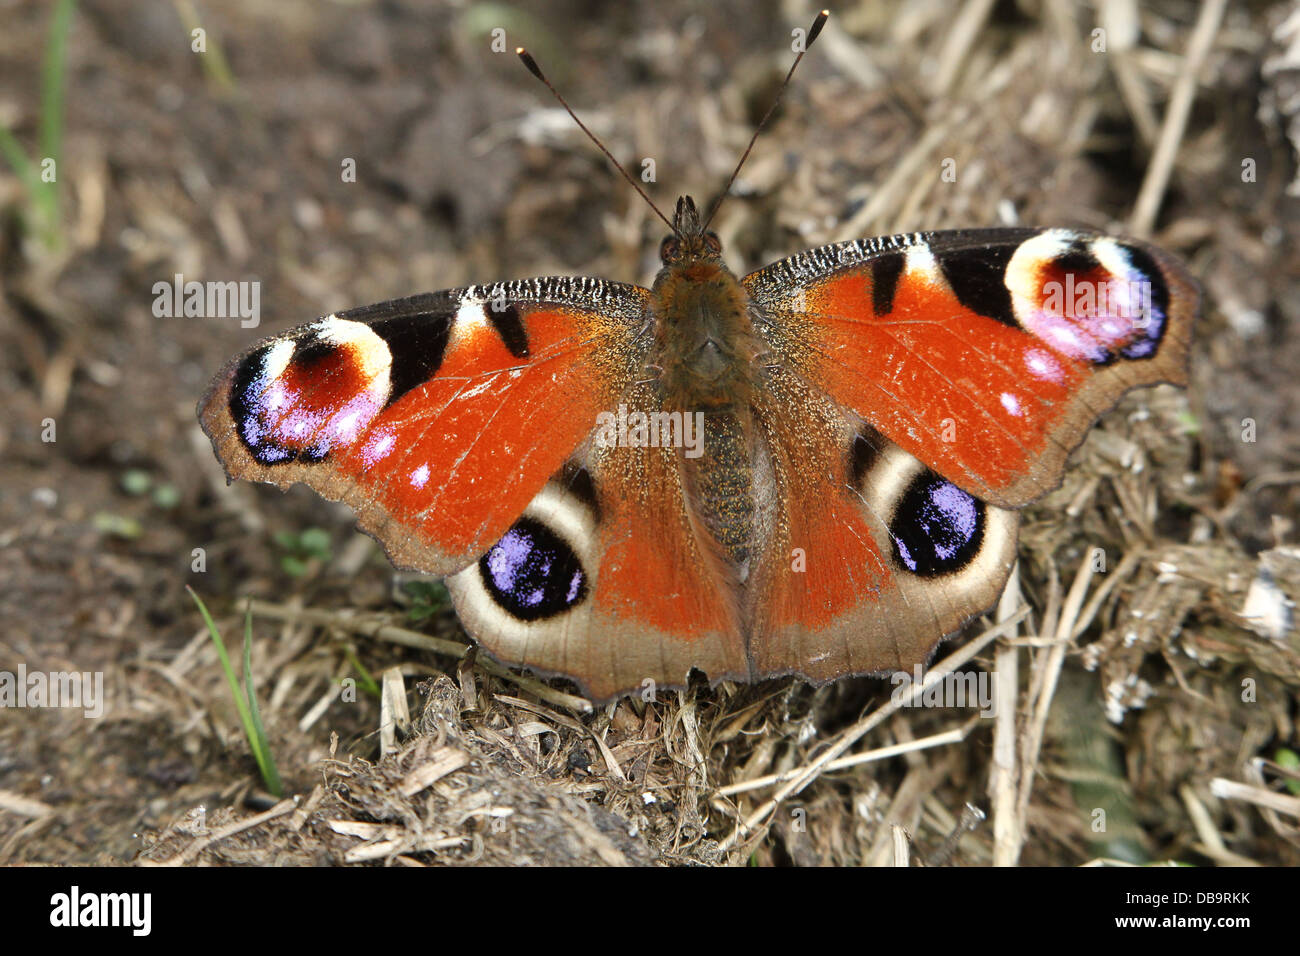 European Common Peacock Butterfly Aglais Io Feeding On A